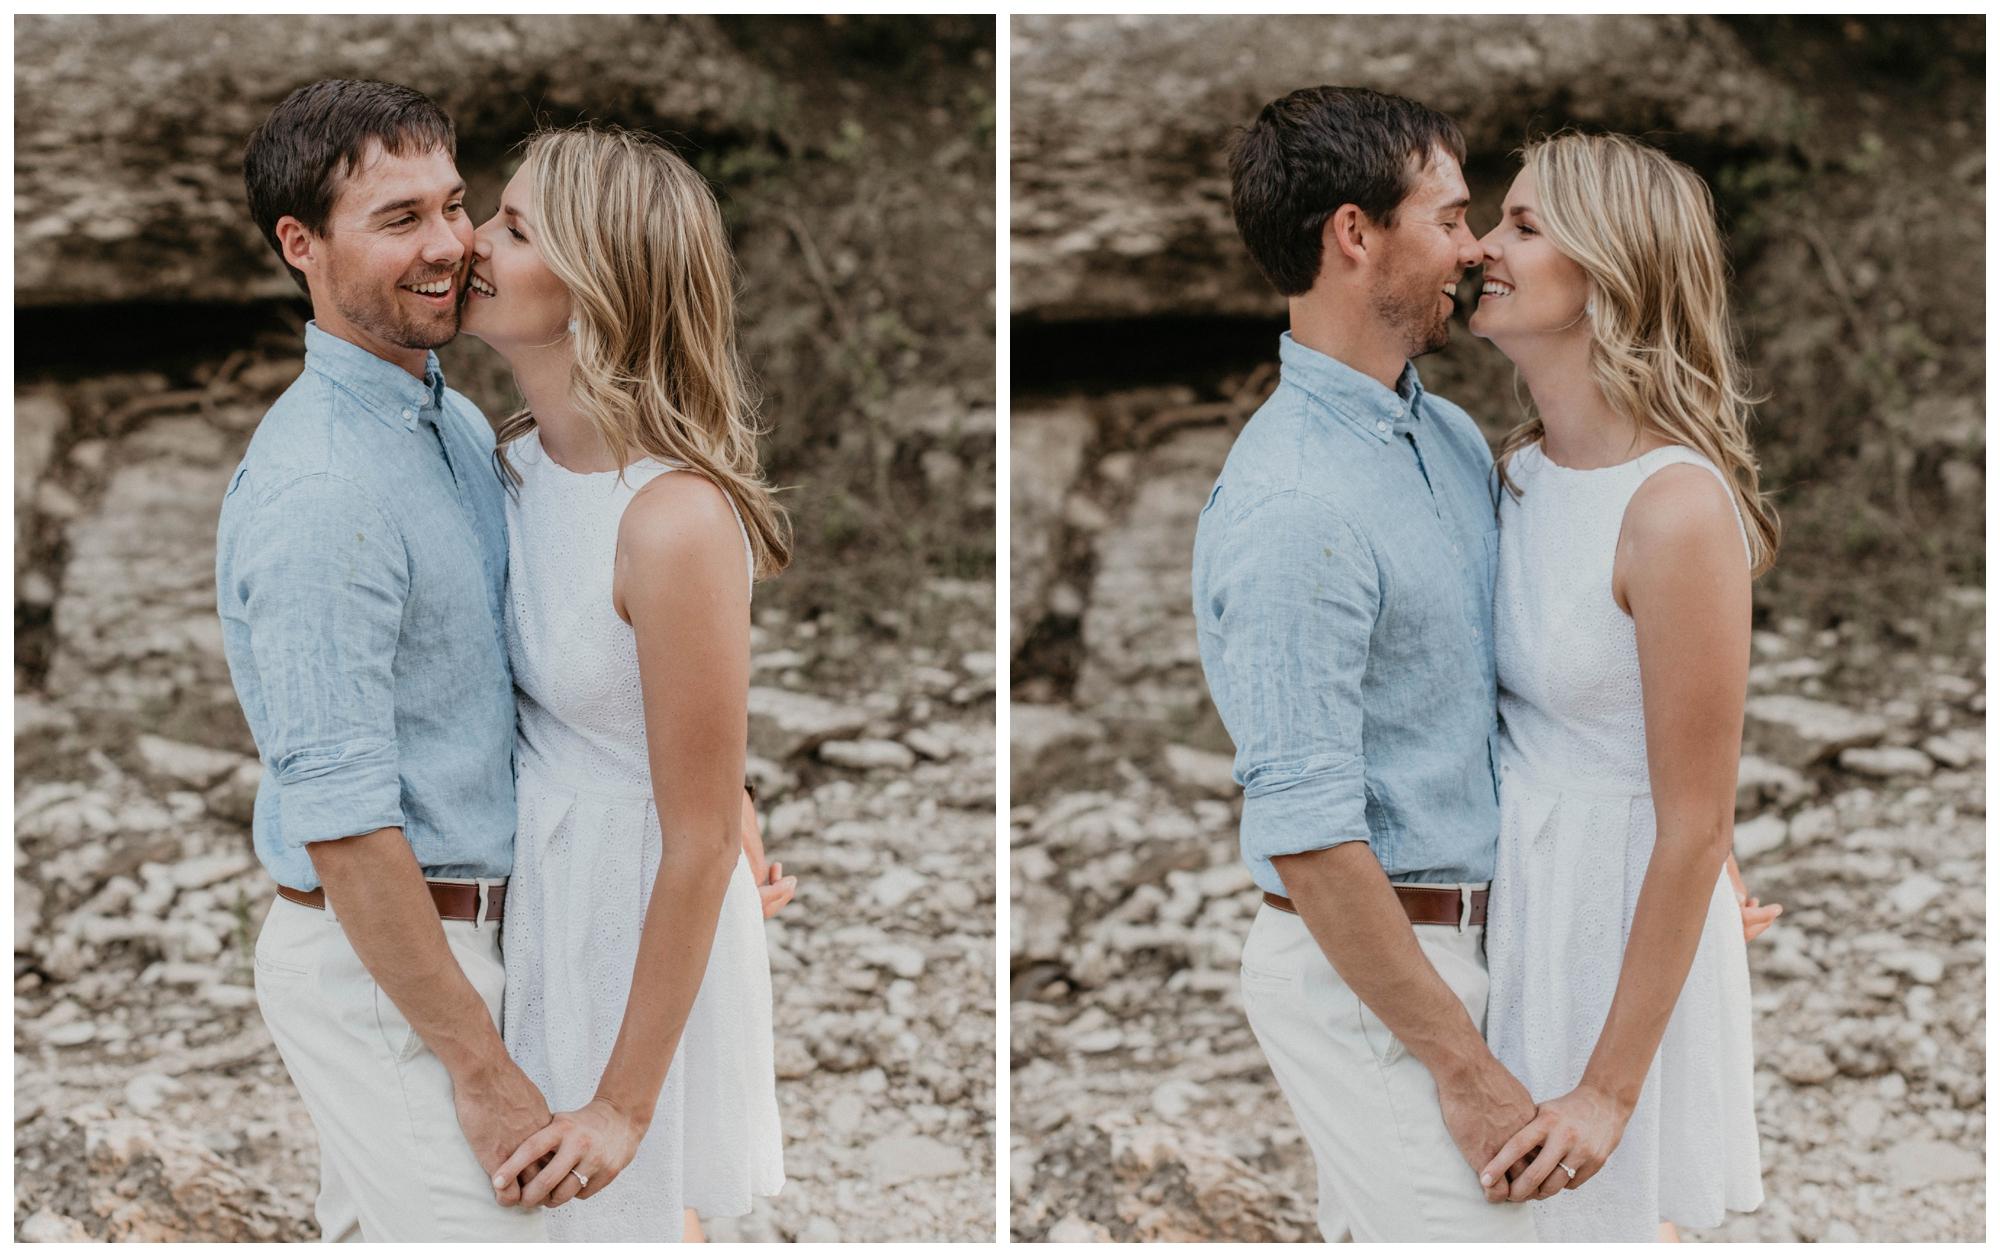 austin-texas-wedding-photography-1778-photographie_0141.jpg